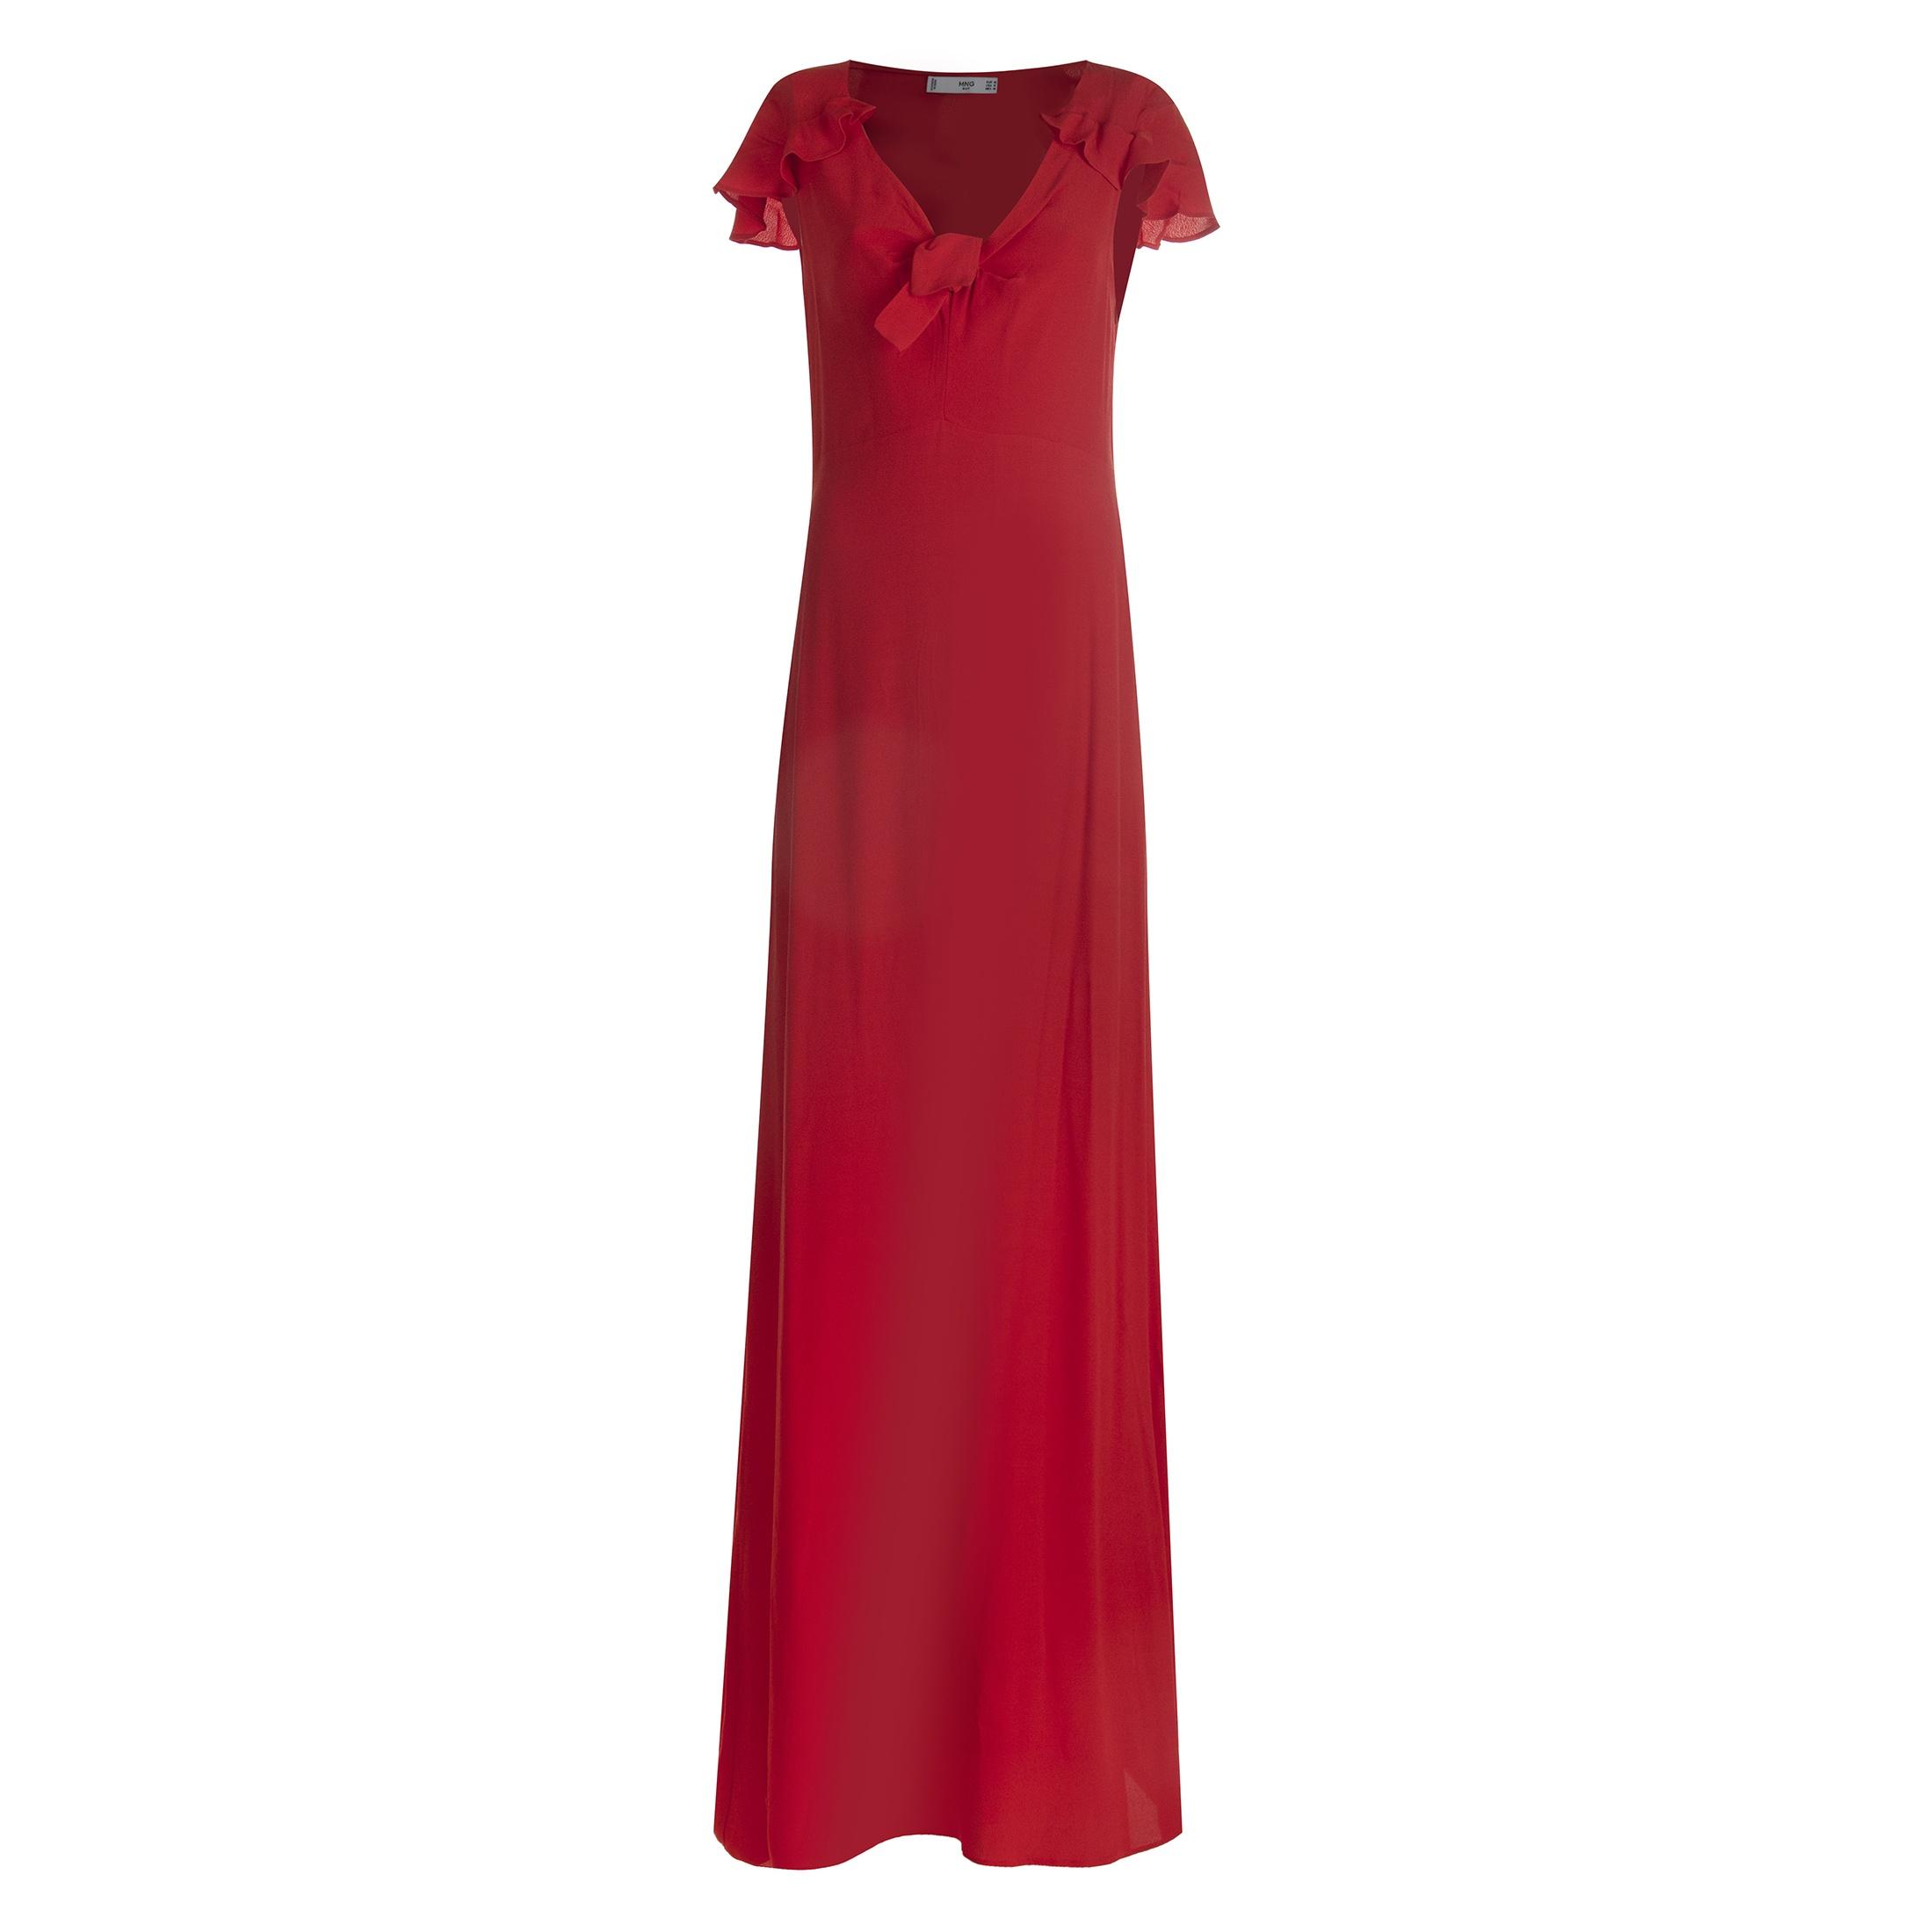 پیراهن ویسکوز بلند زنانه - مانگو